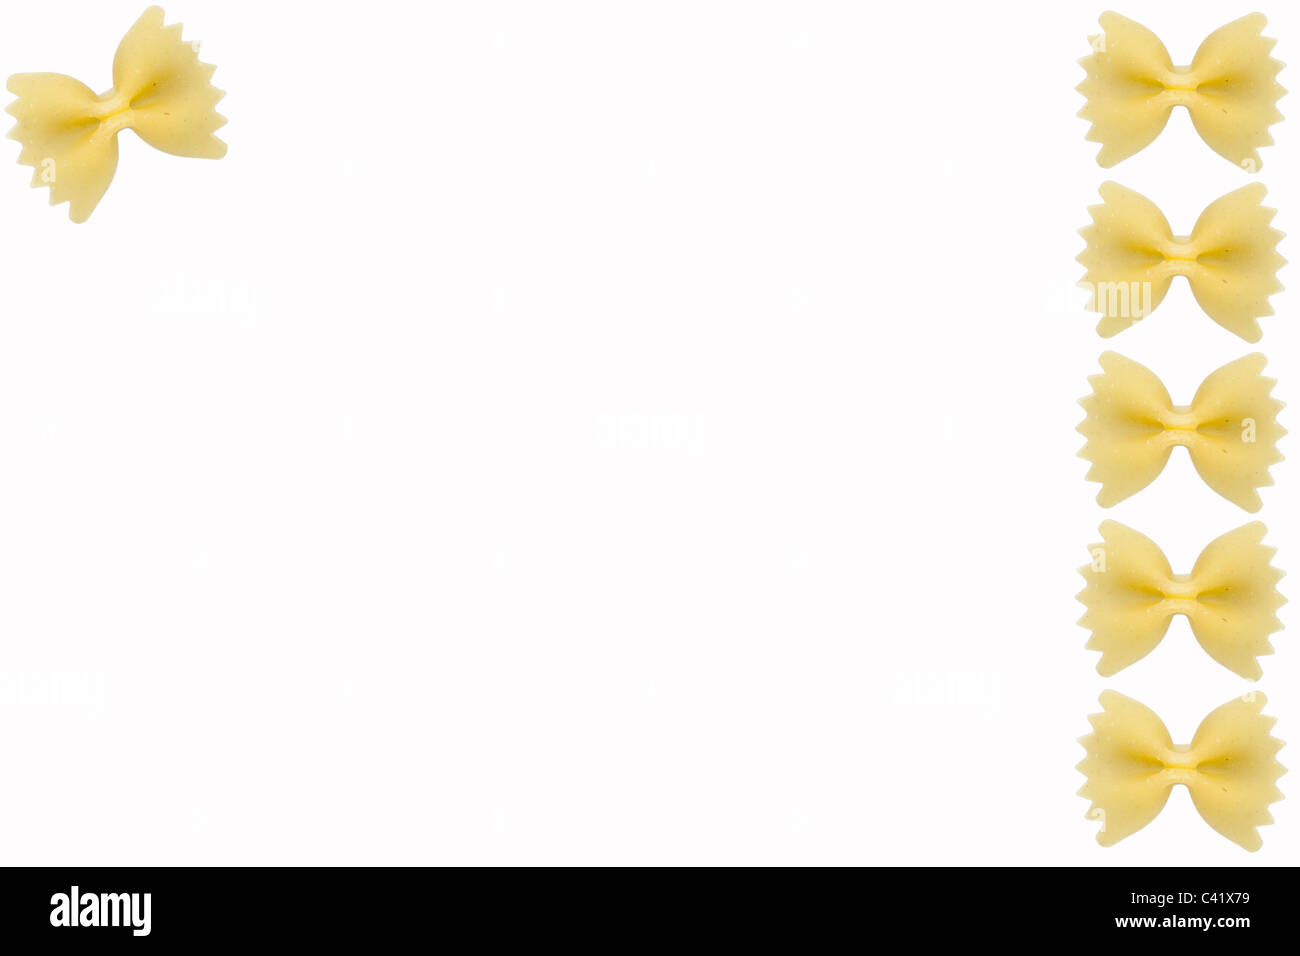 uncooked pasta on white background - Stock Image